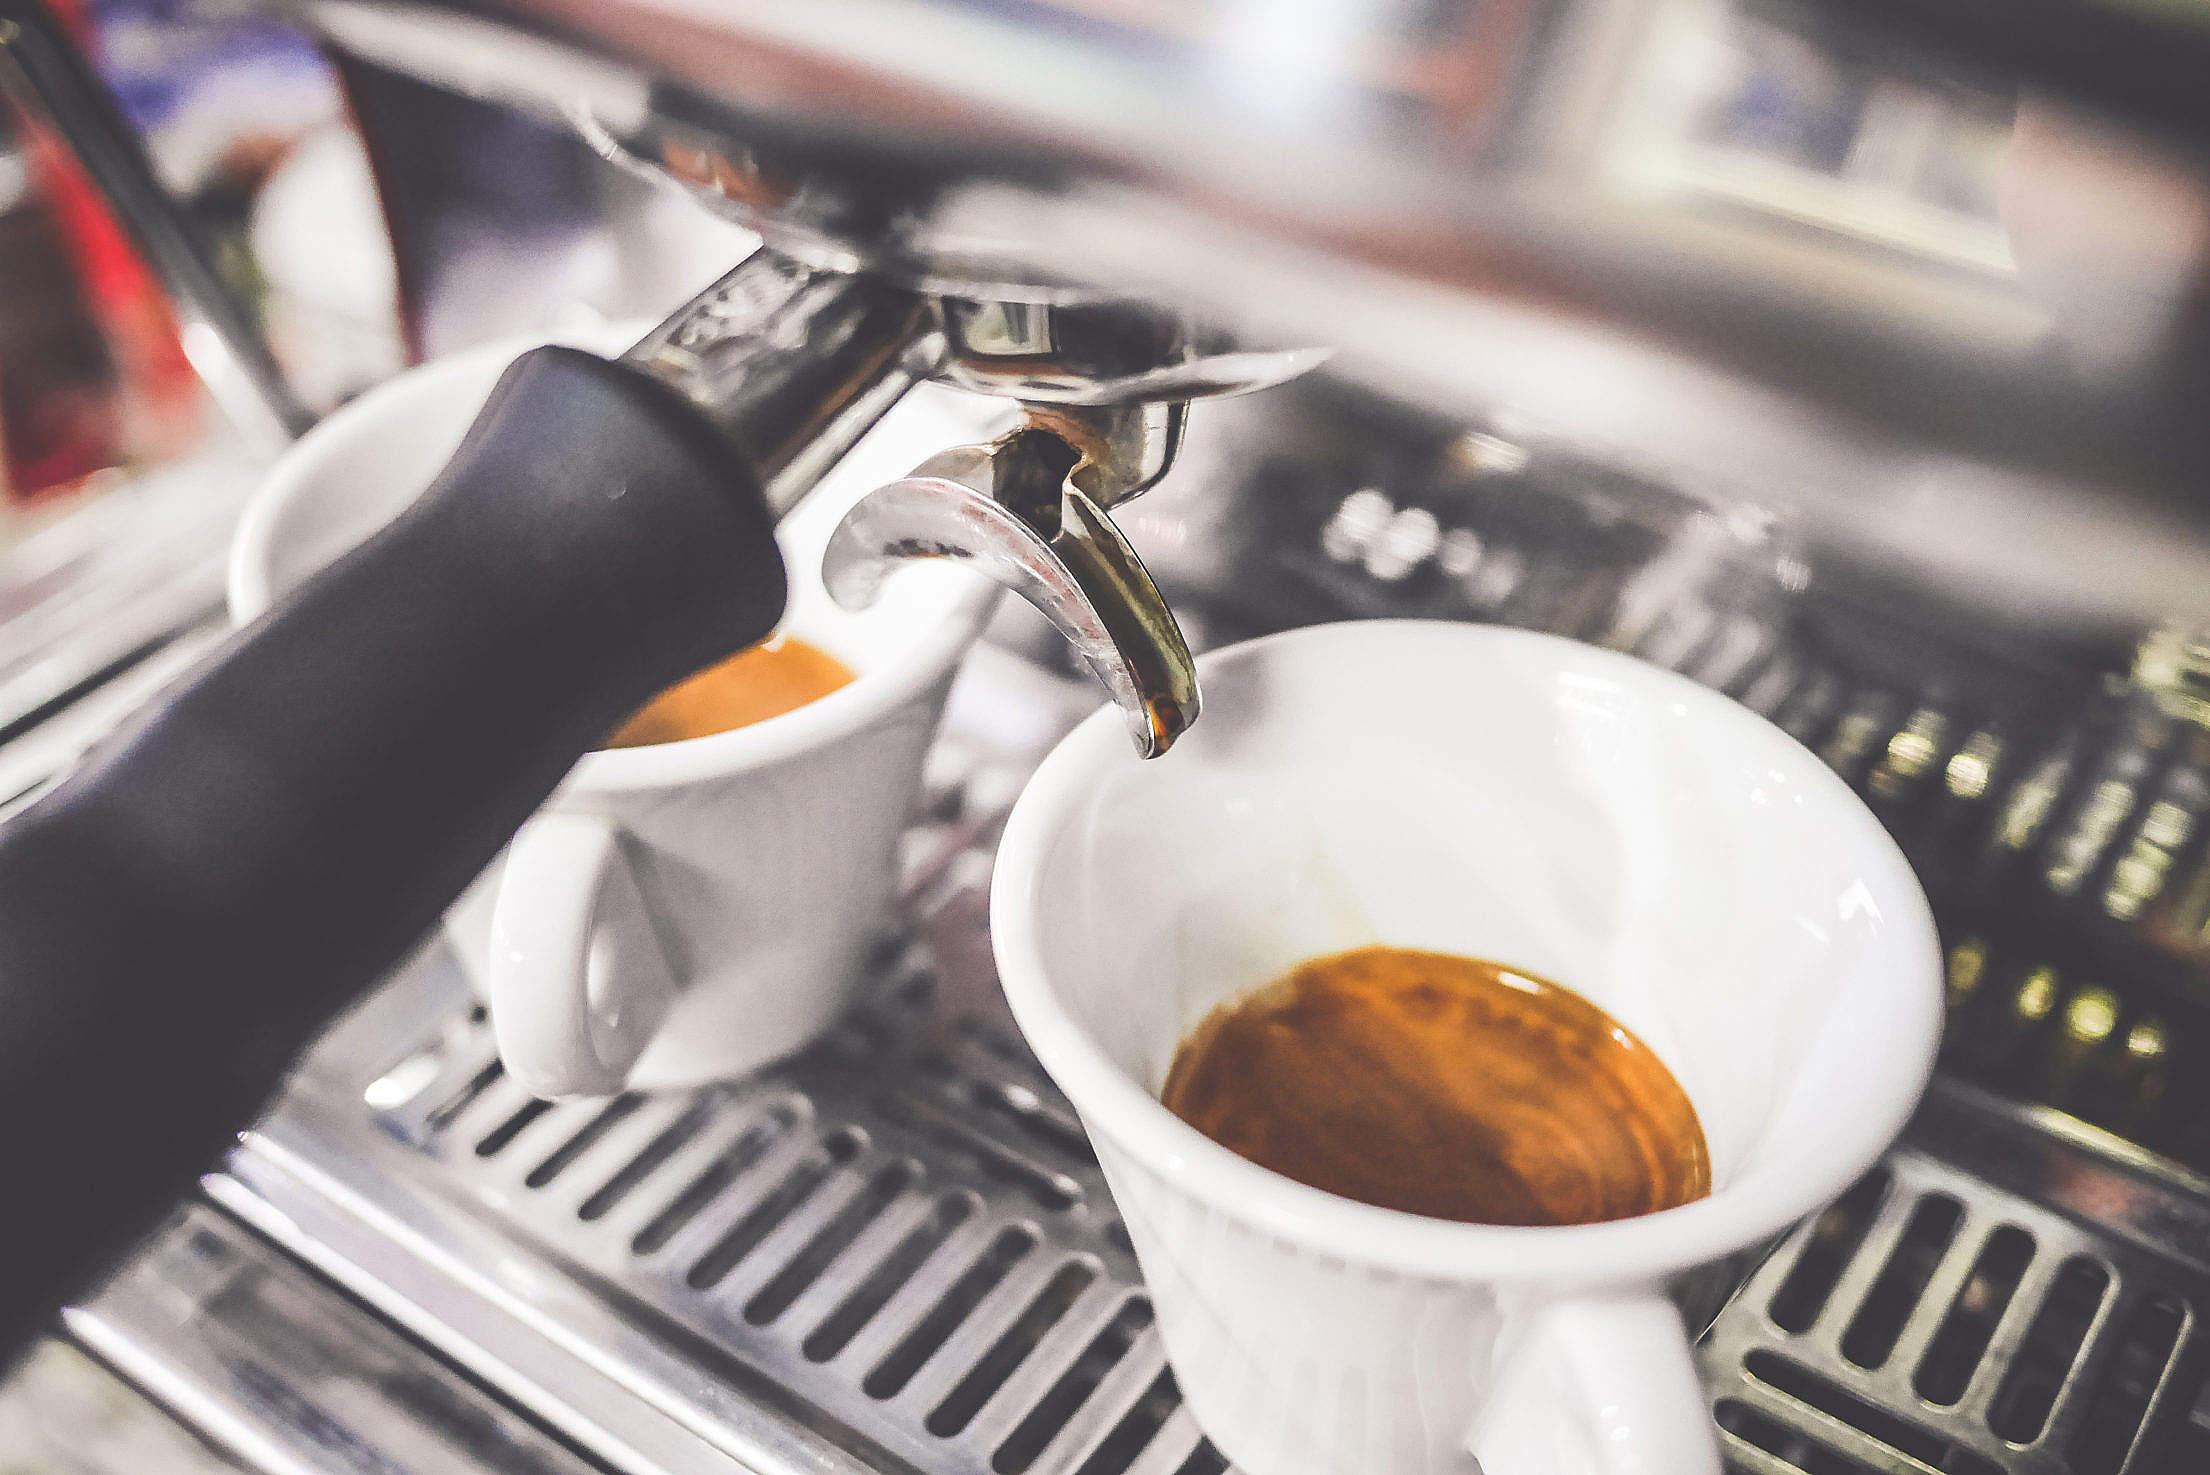 freshly-brewed-coffees-from-coffee-machine_free_stock_photos_picjumbo_P1010379-2210x1475.jpg